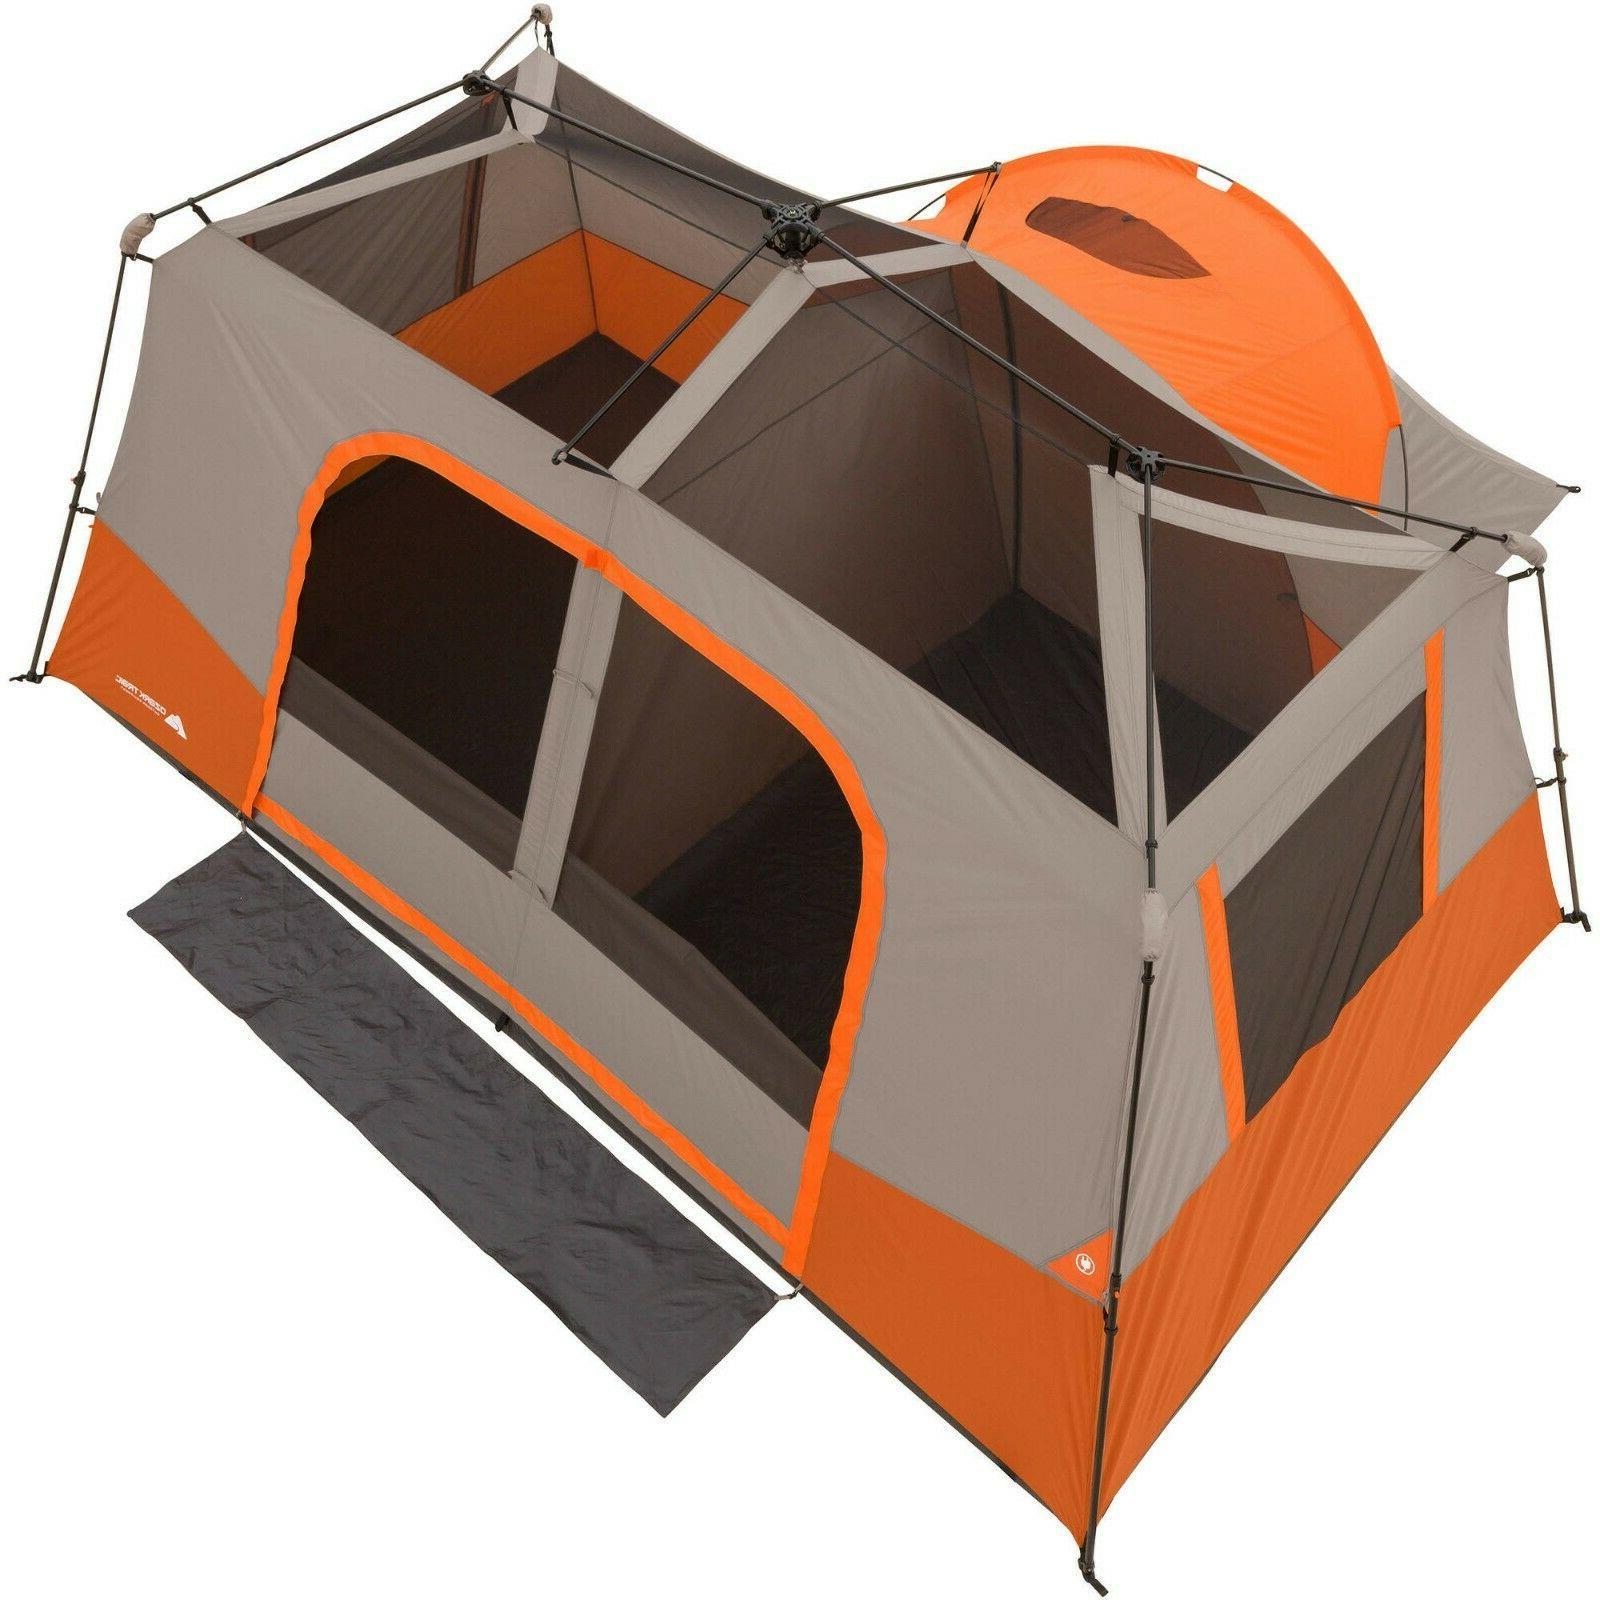 Tent Season Camping Hiking NEW